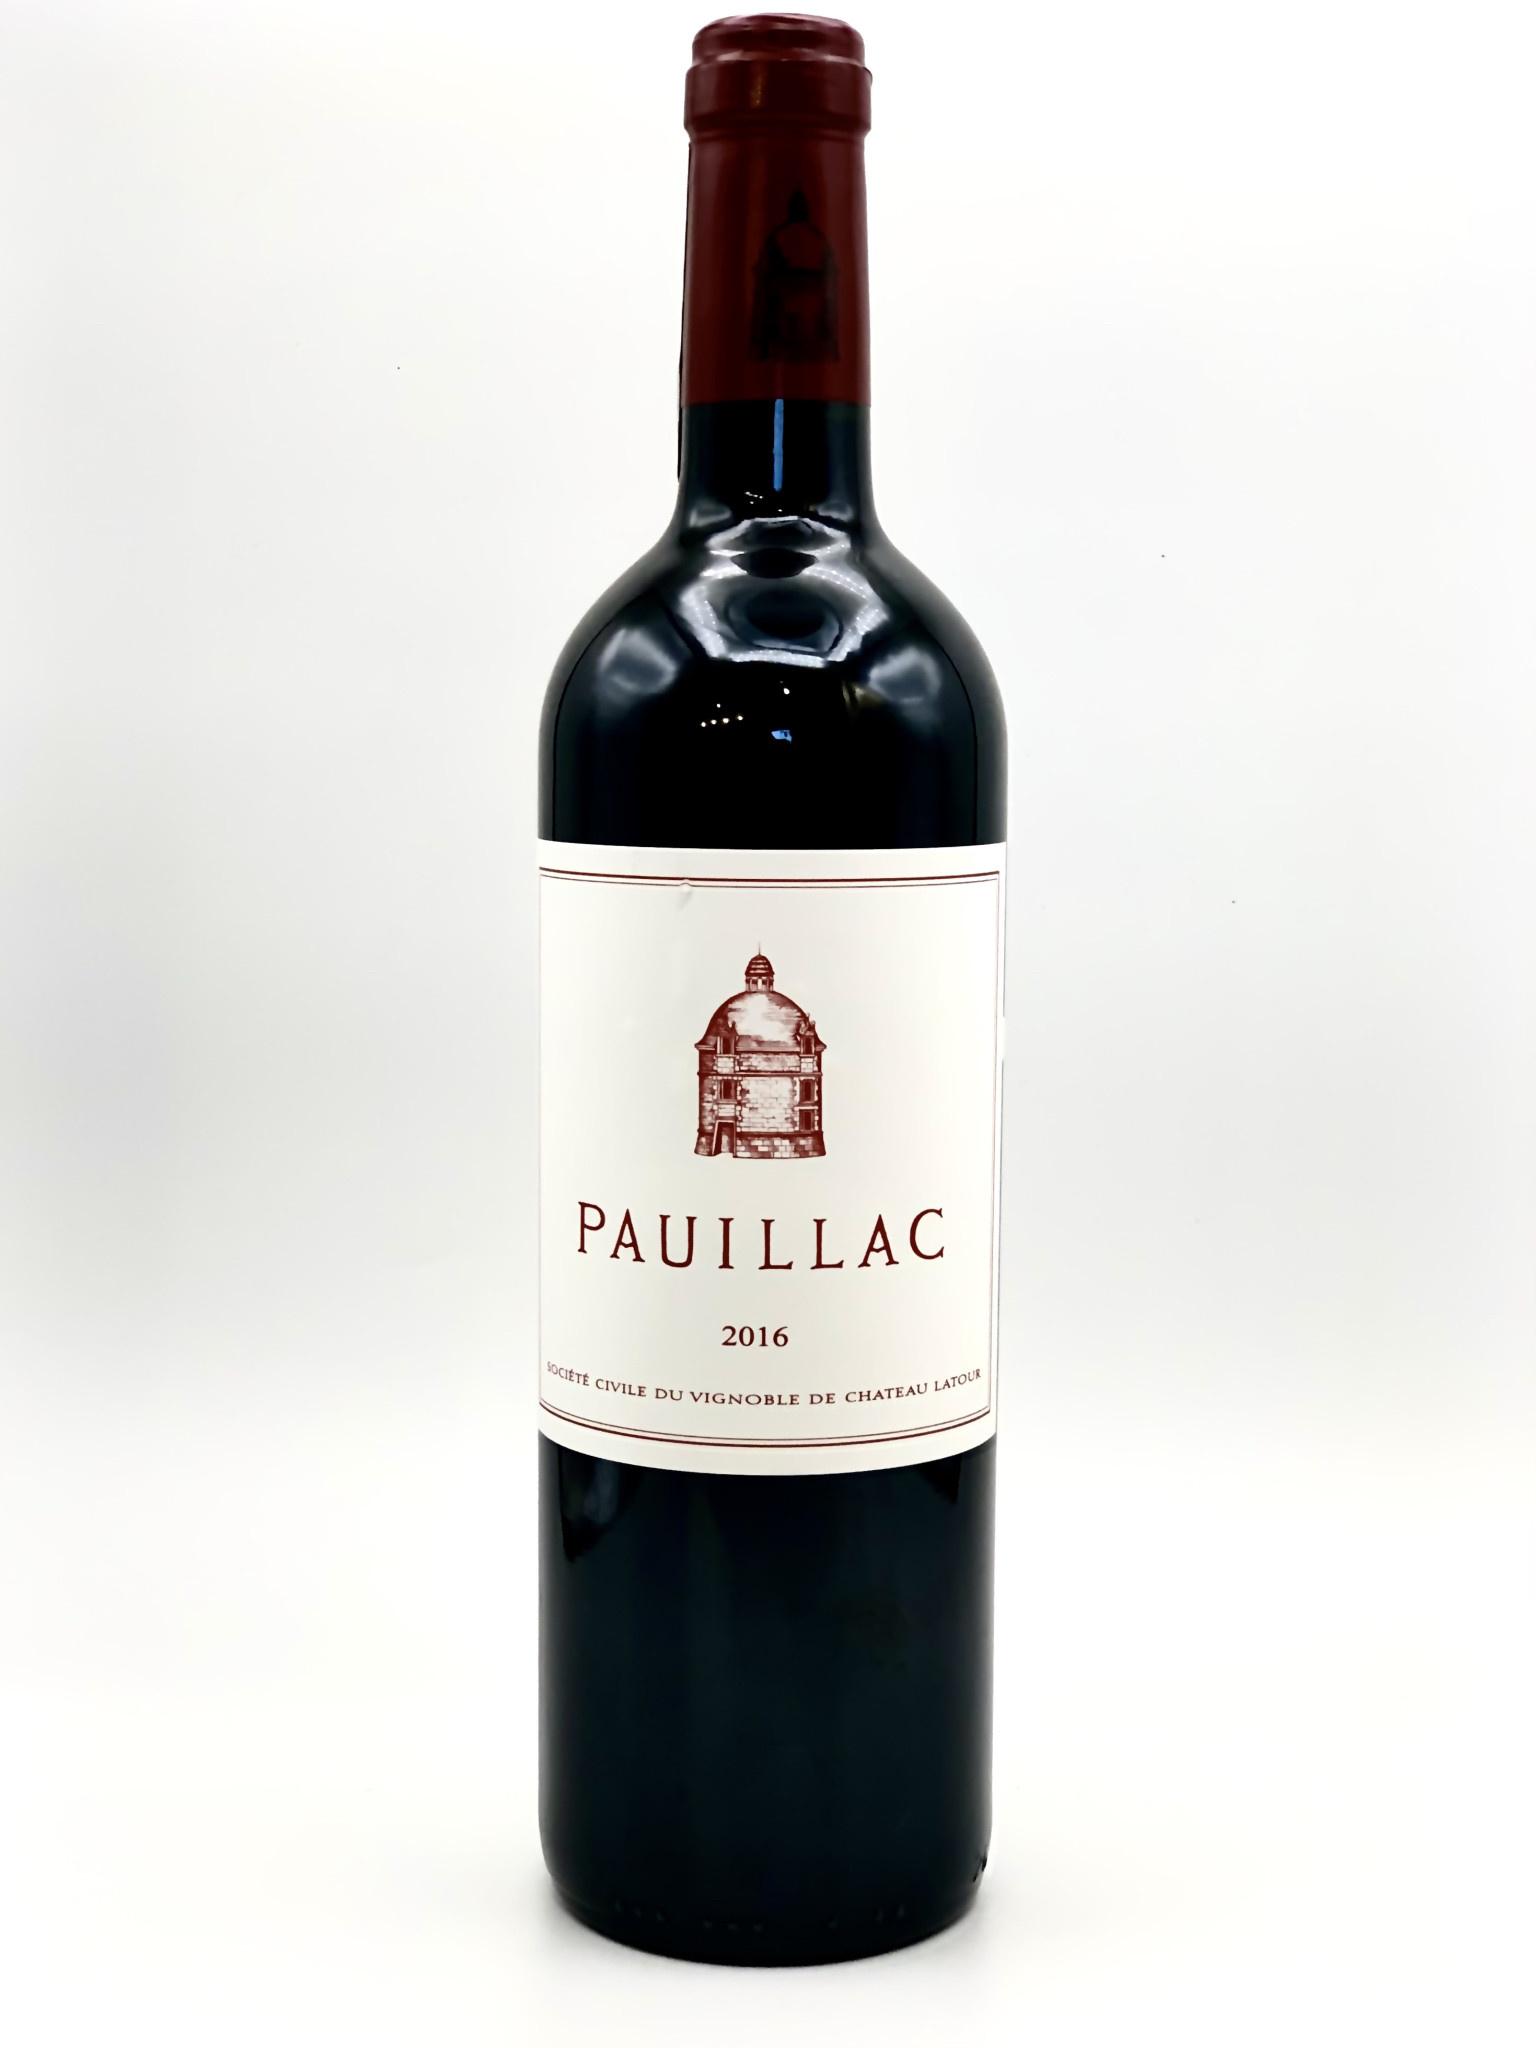 Pauillac 2016 Le Pauillac de Chateau Latour  750ml